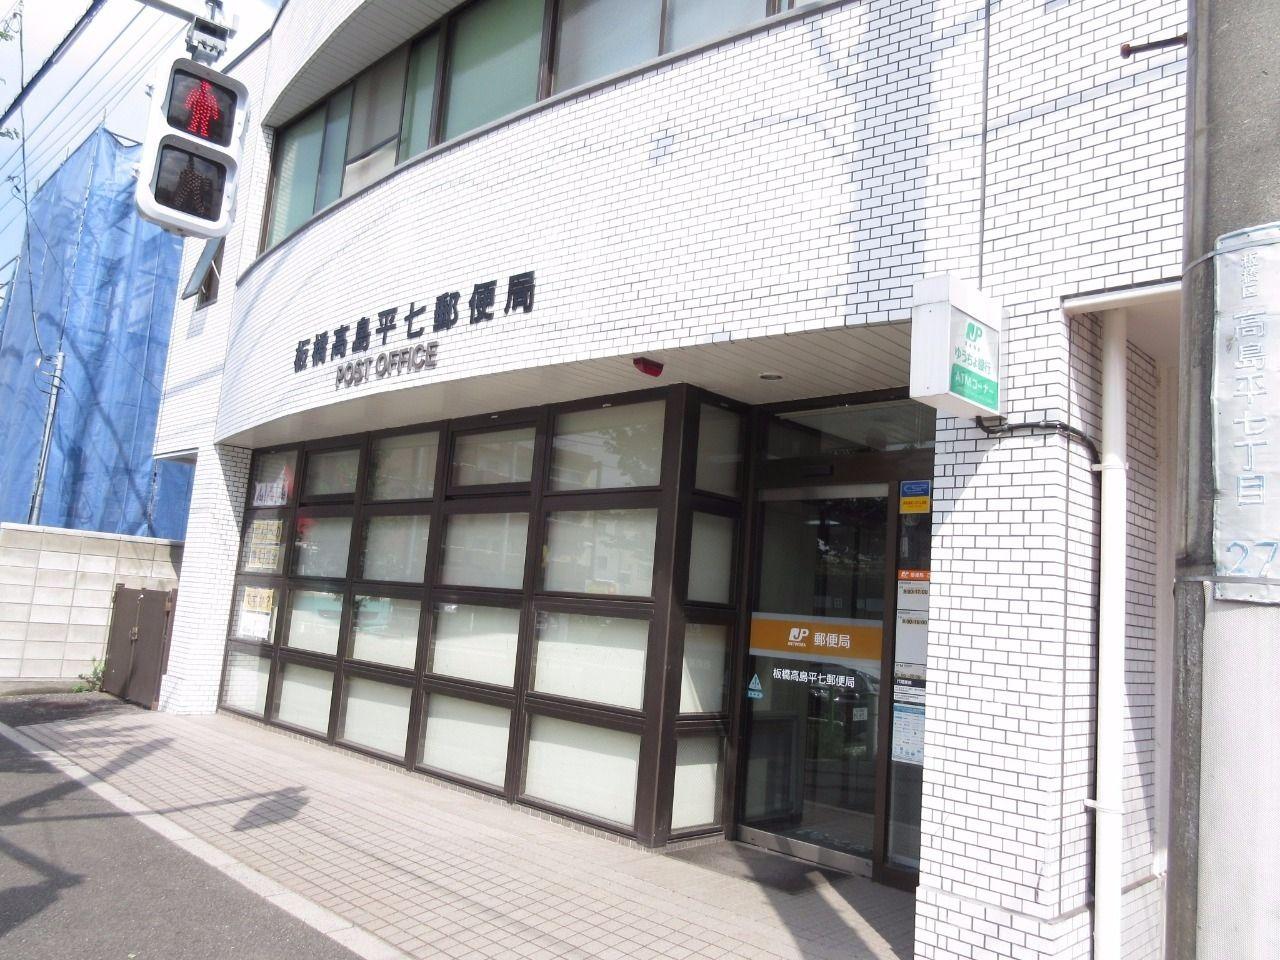 板橋高島平七郵便局まで徒歩3分・270m